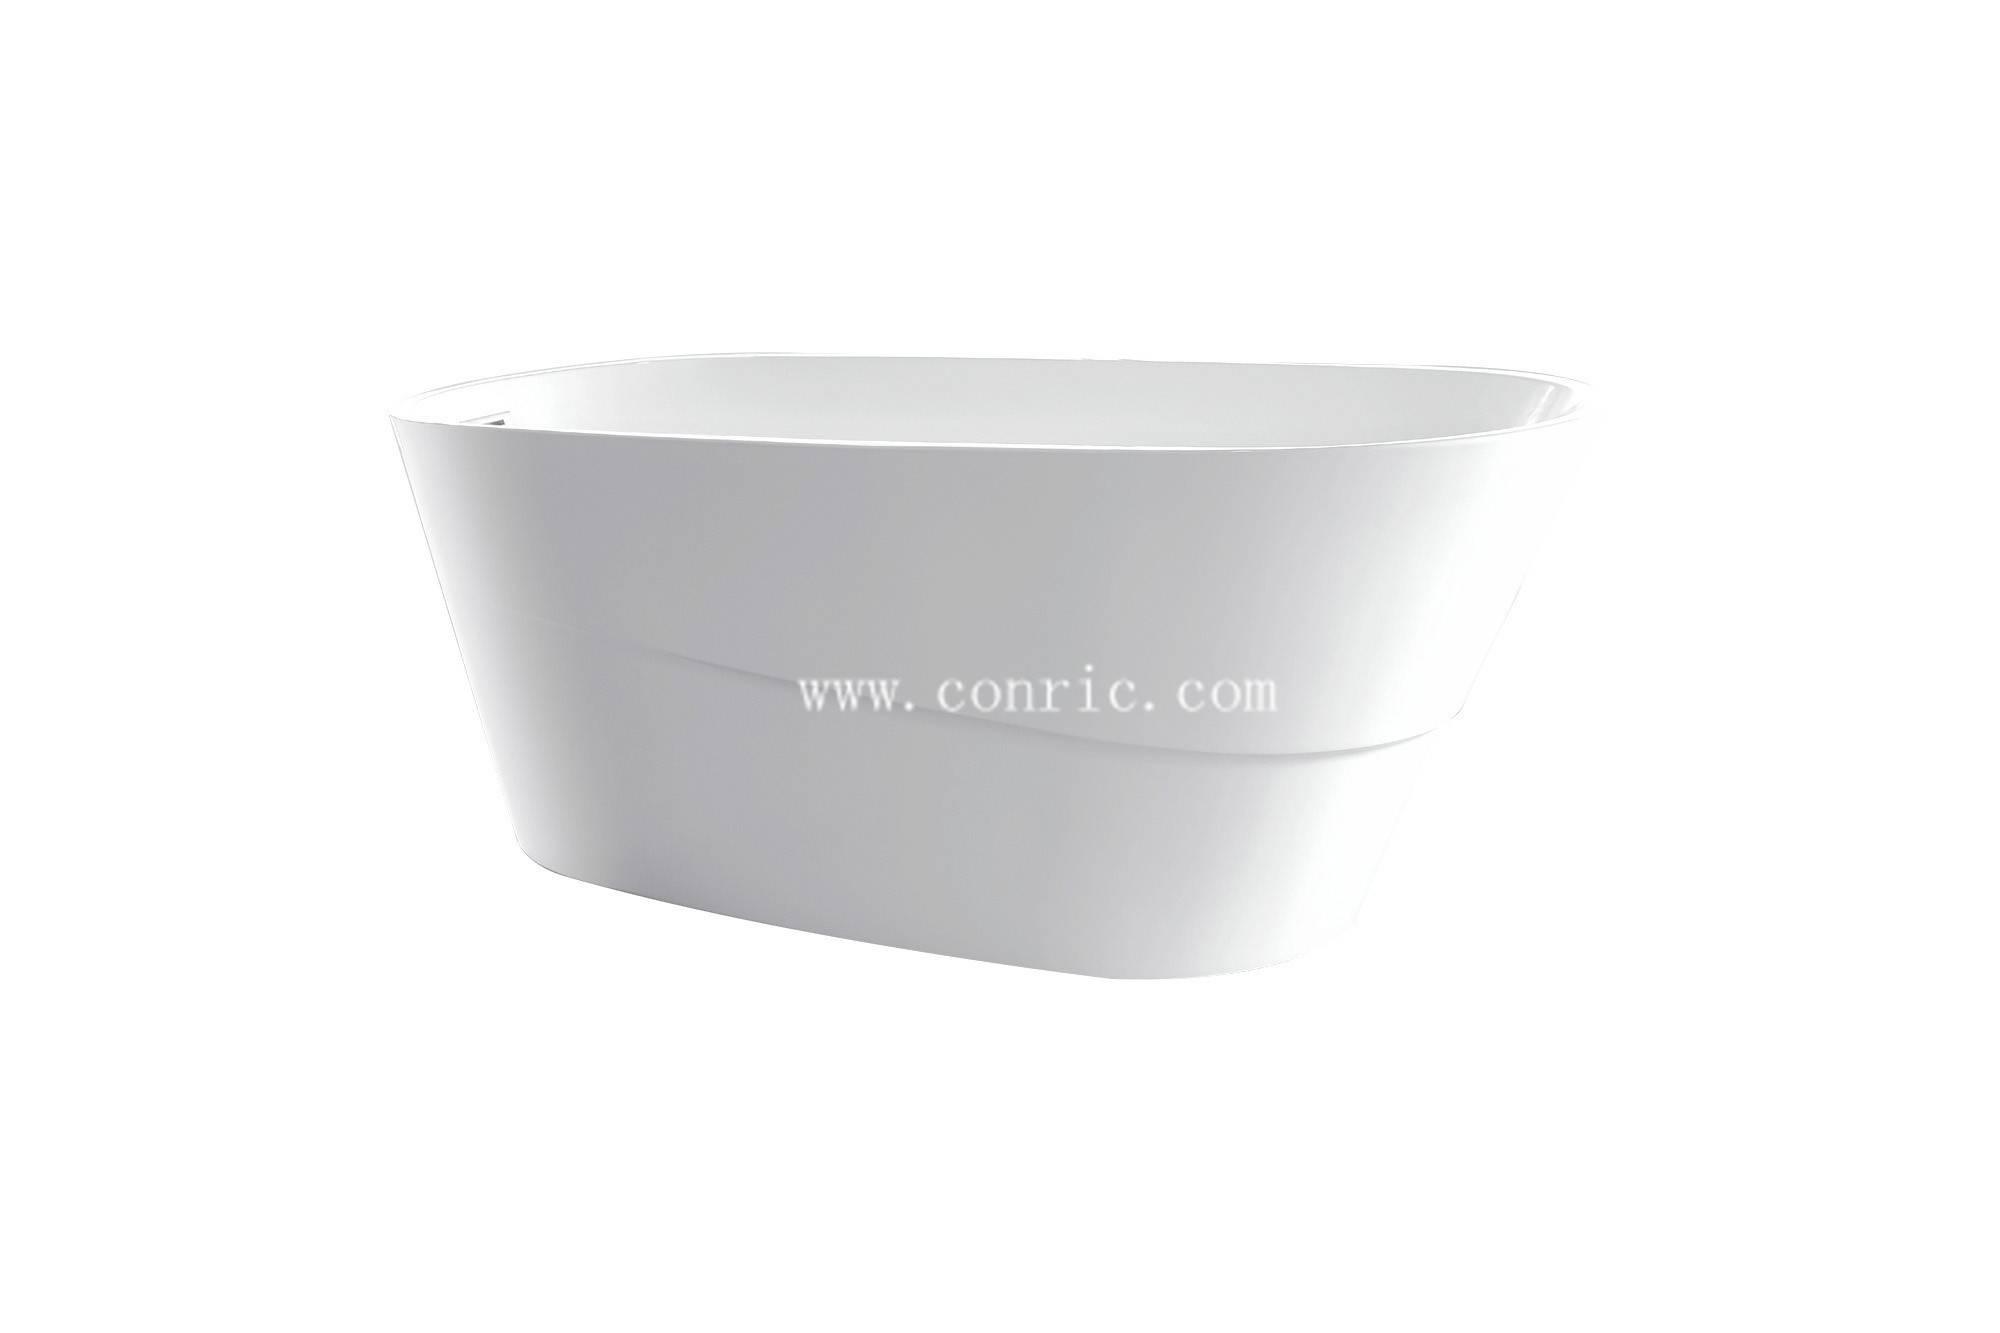 Hangzhou factory pure acrylic material freestanding bathtub